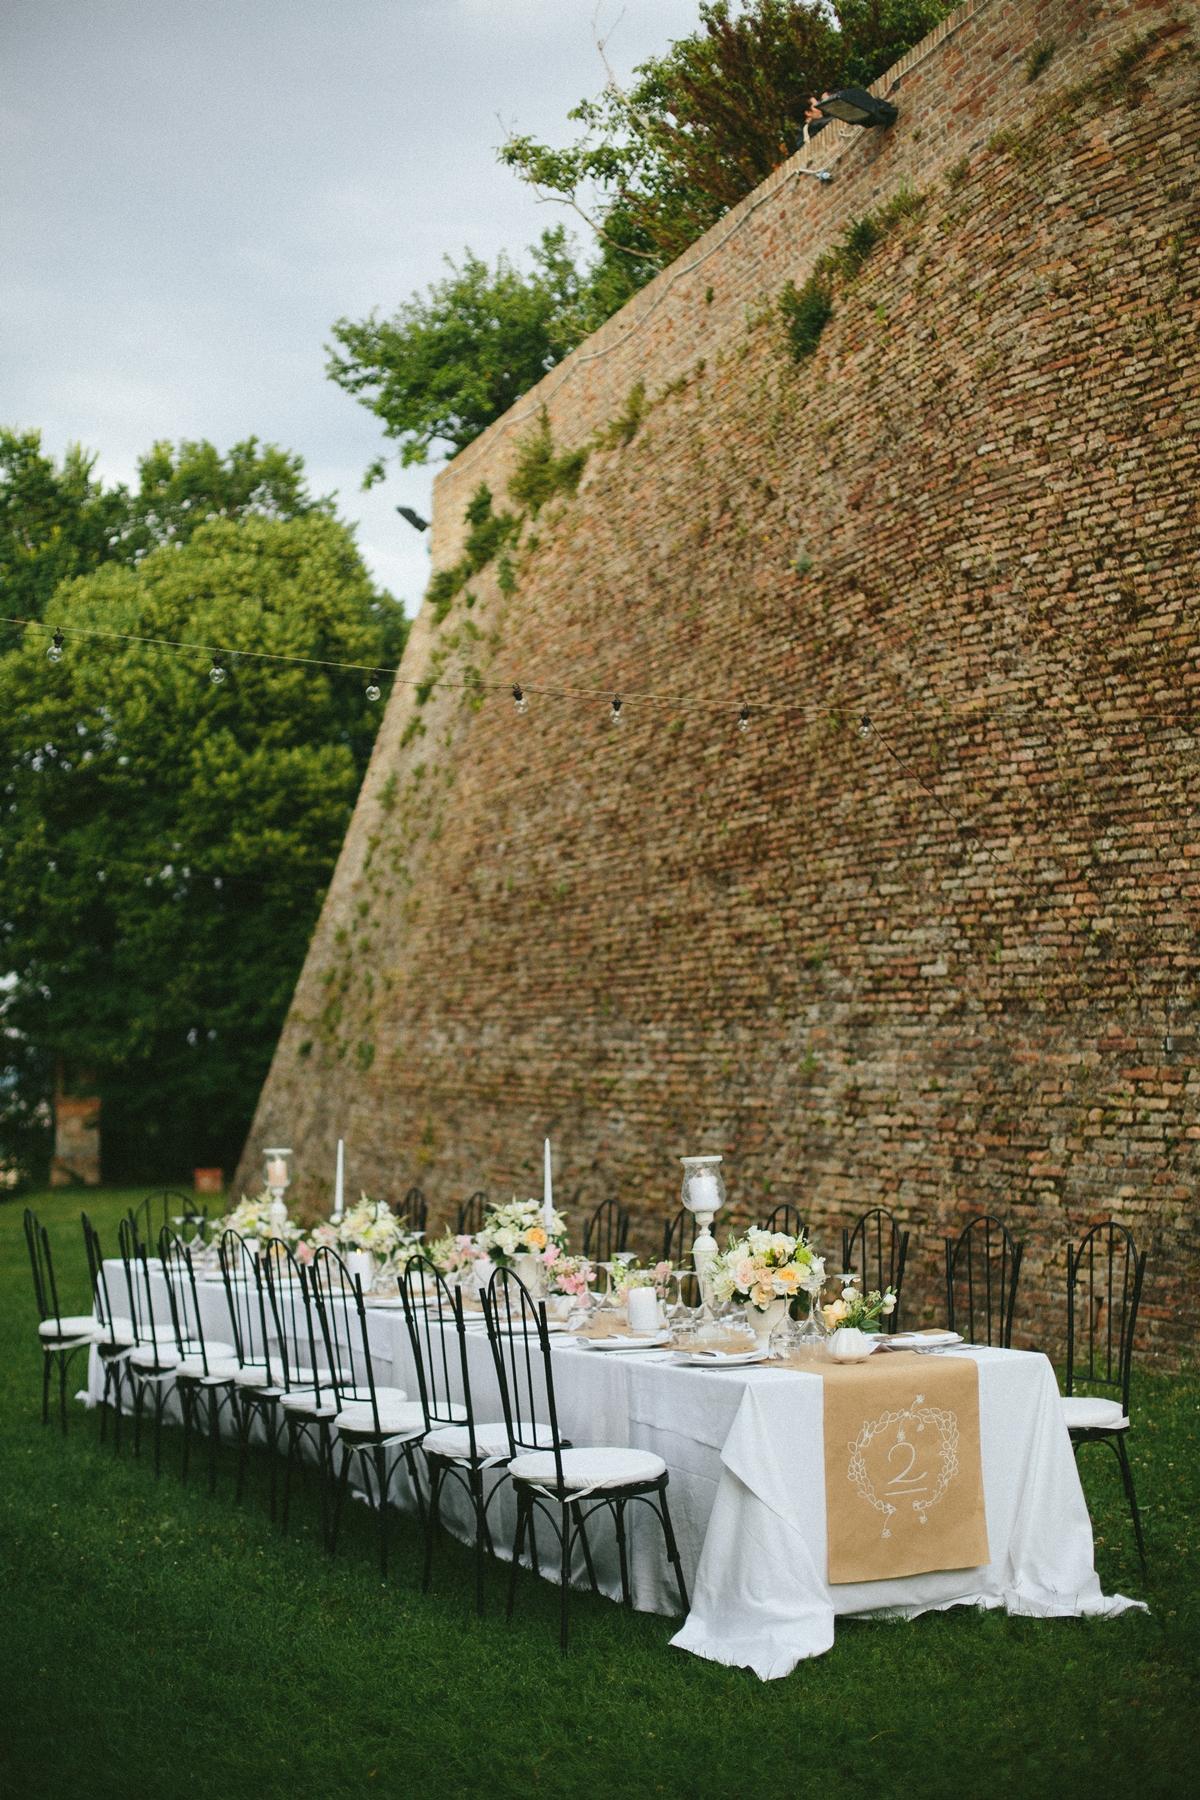 wedding-table-n-2-montegridolfo.jpg